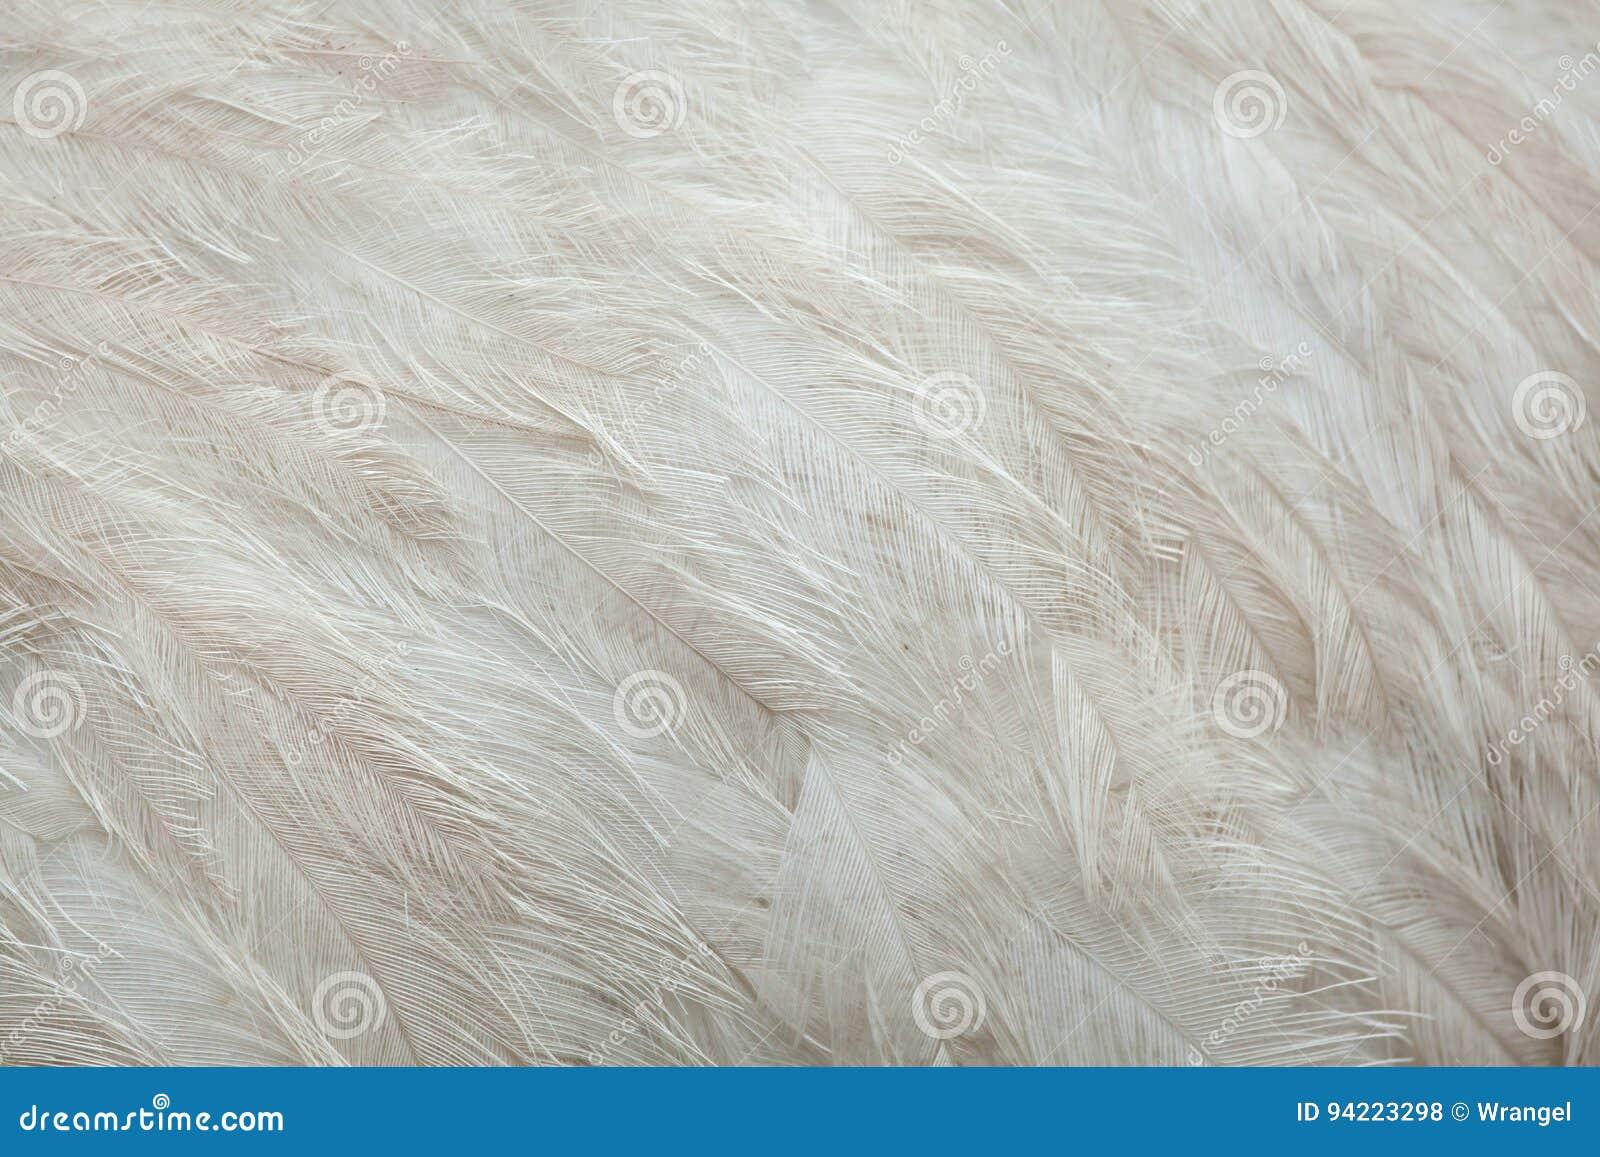 Un plus grand nandou de nandou americana Texture de plumage